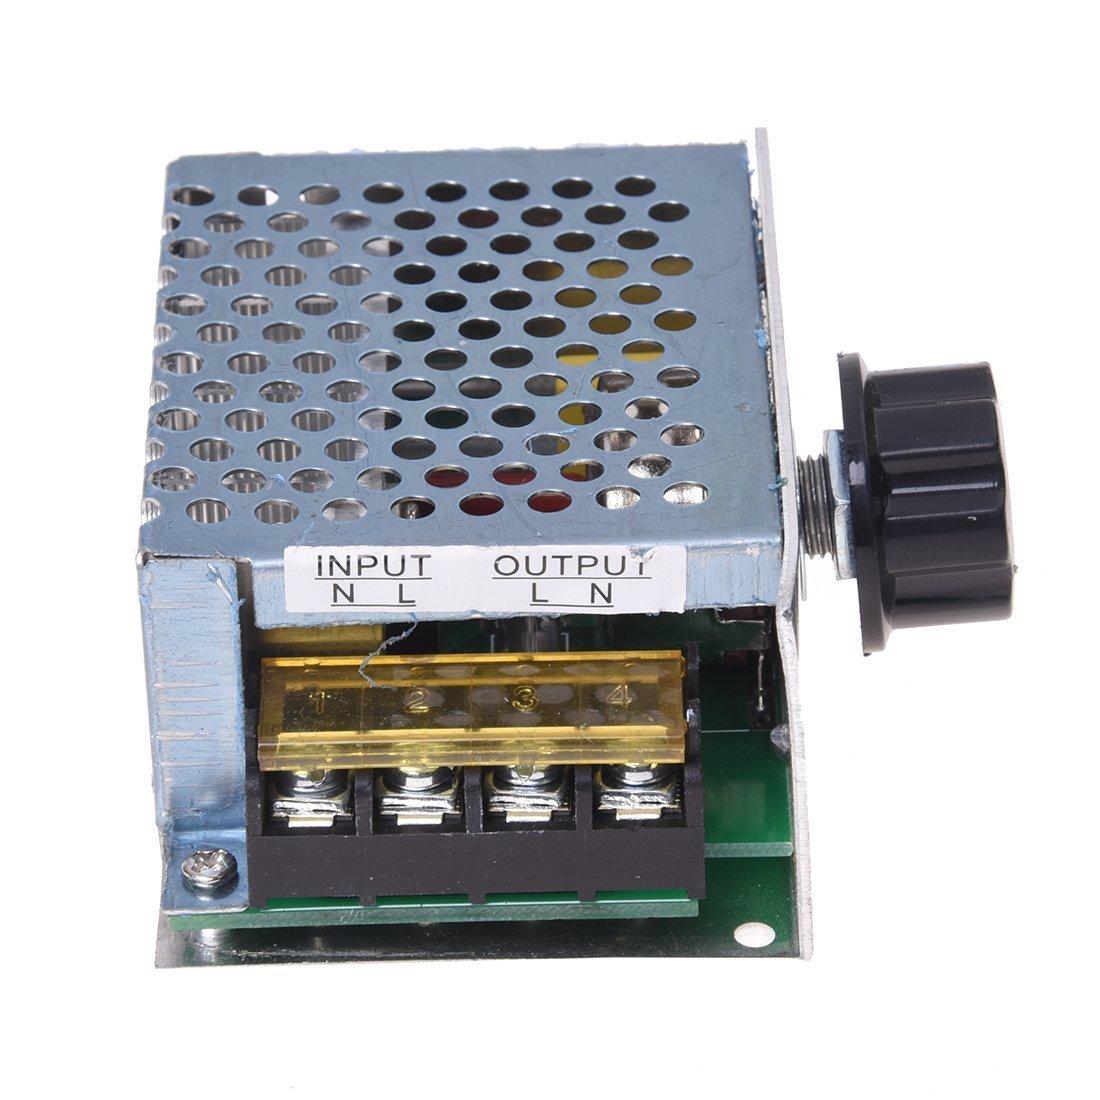 SODIAL(R) Regulador Controlador de Tension Voltaje Silicio Alta Potencia 4000W con Cascara product